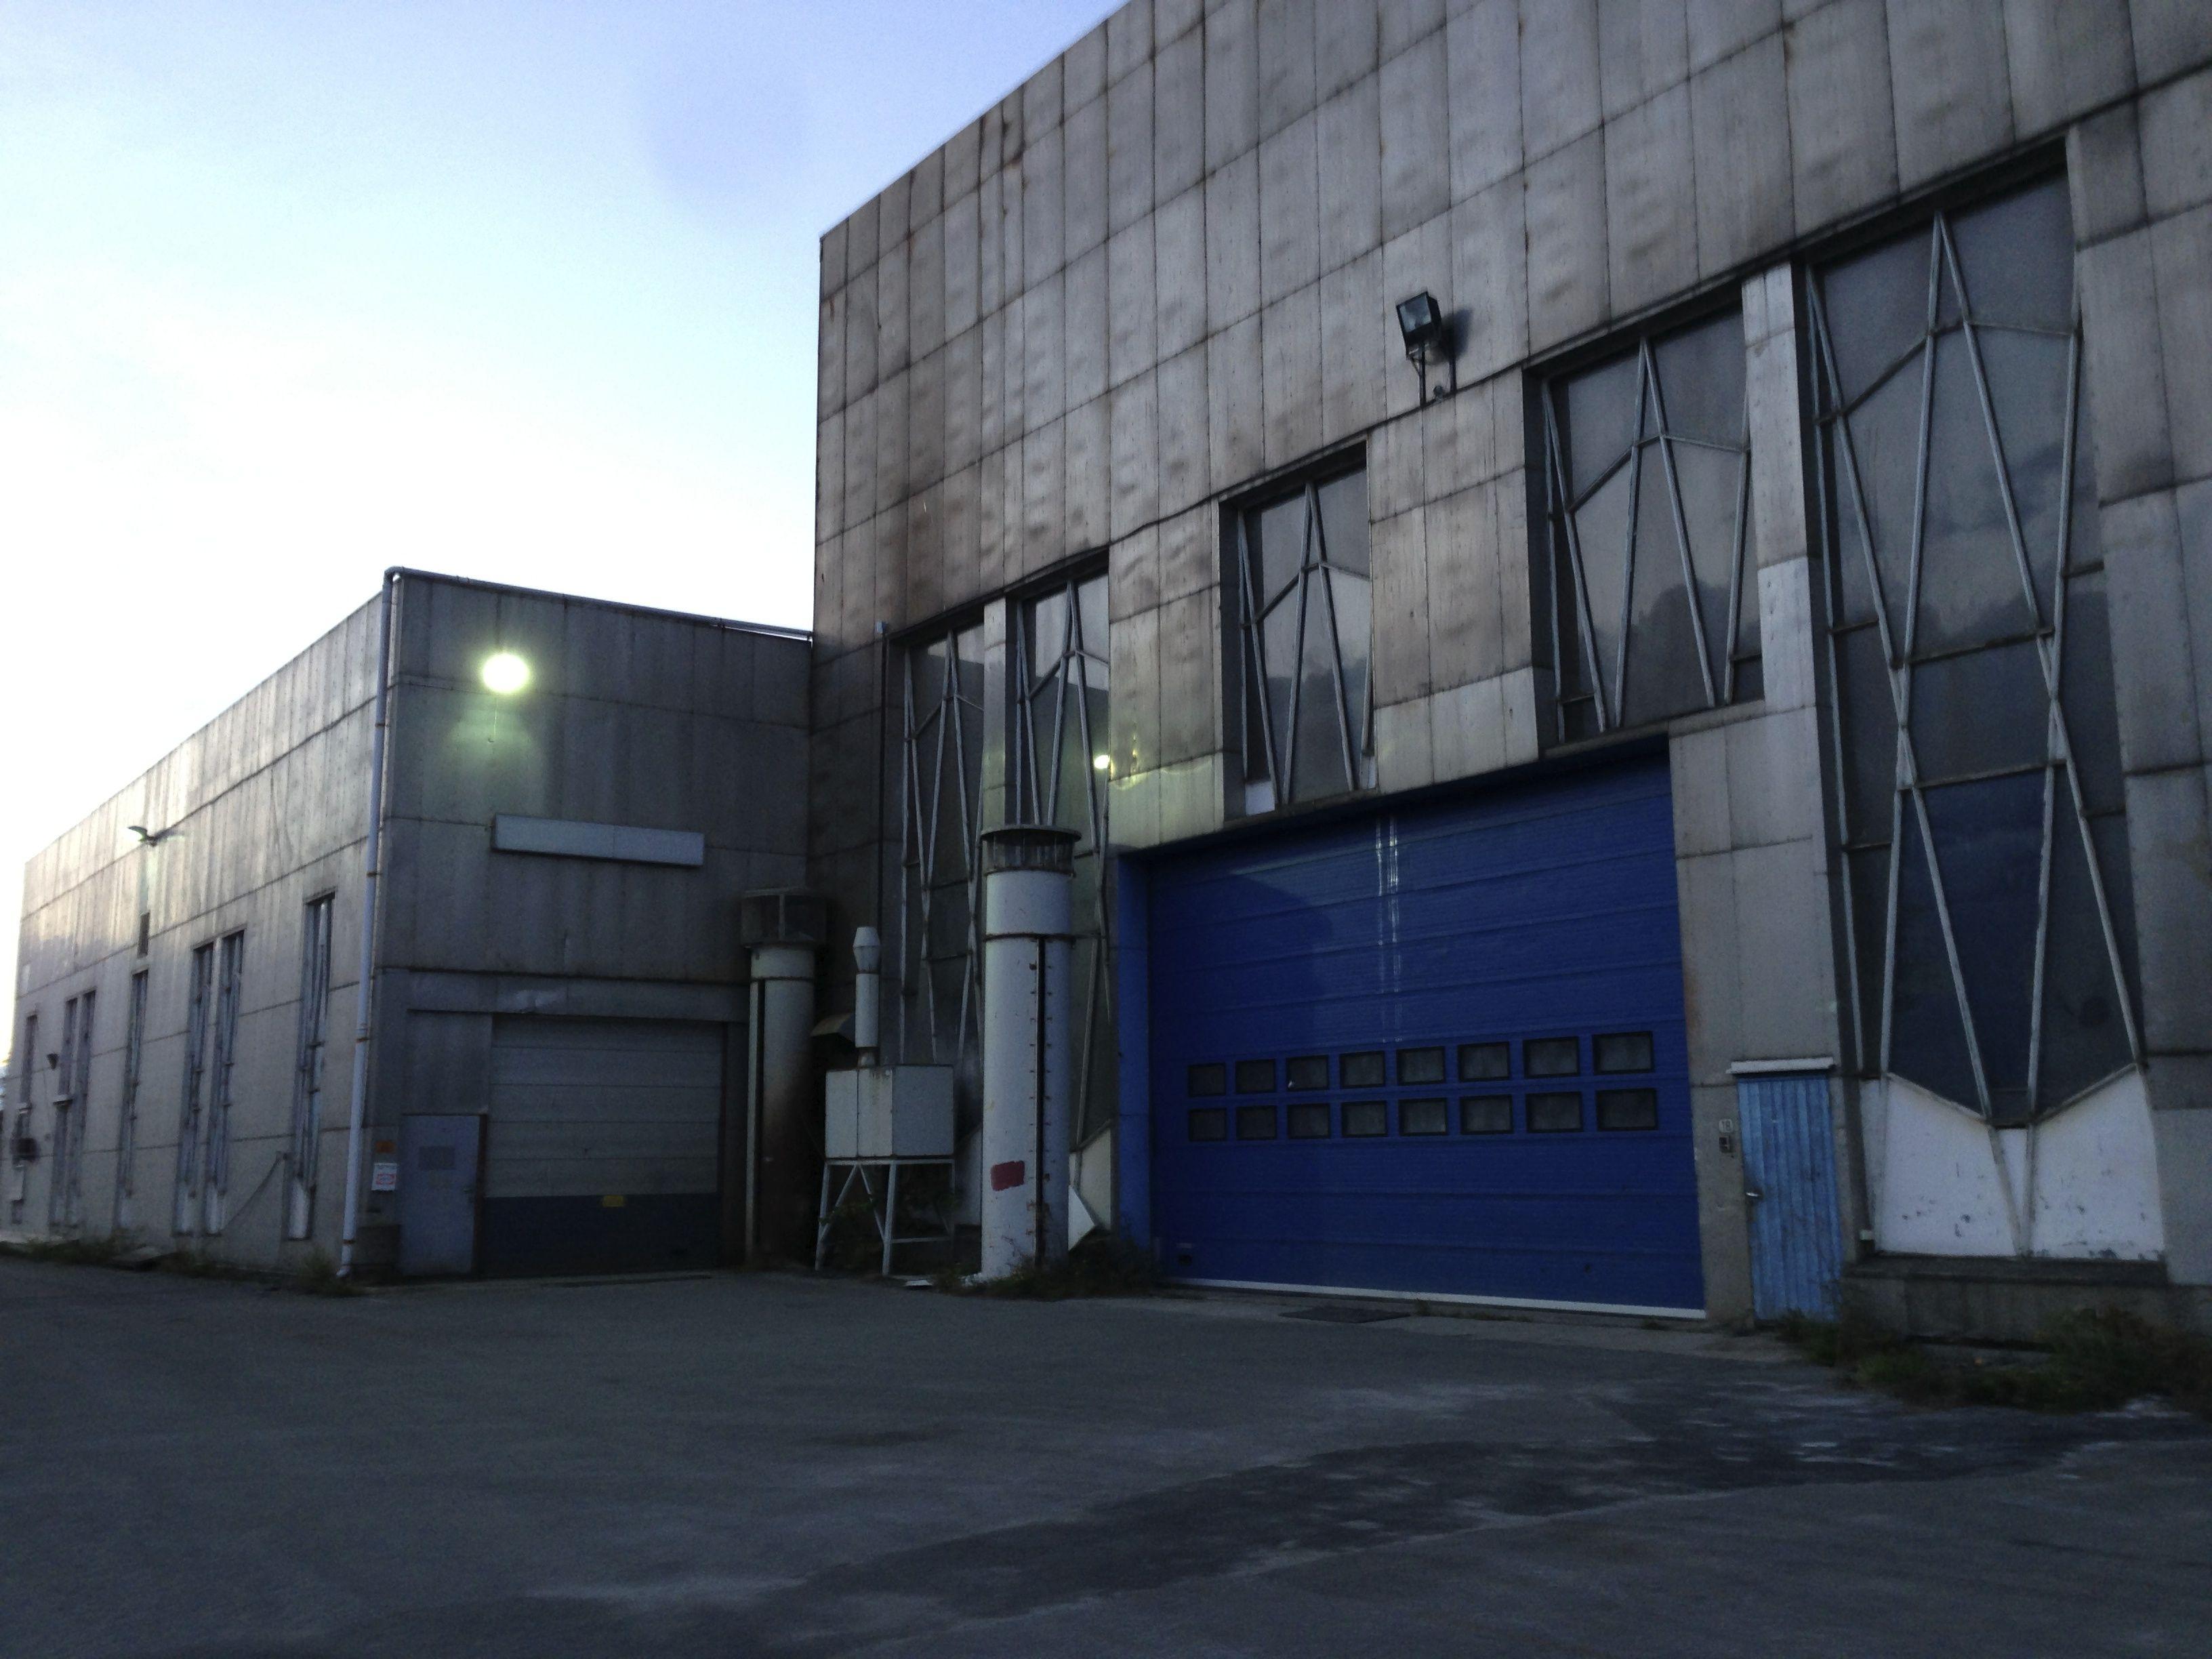 Arkitektur - Hamjern-området